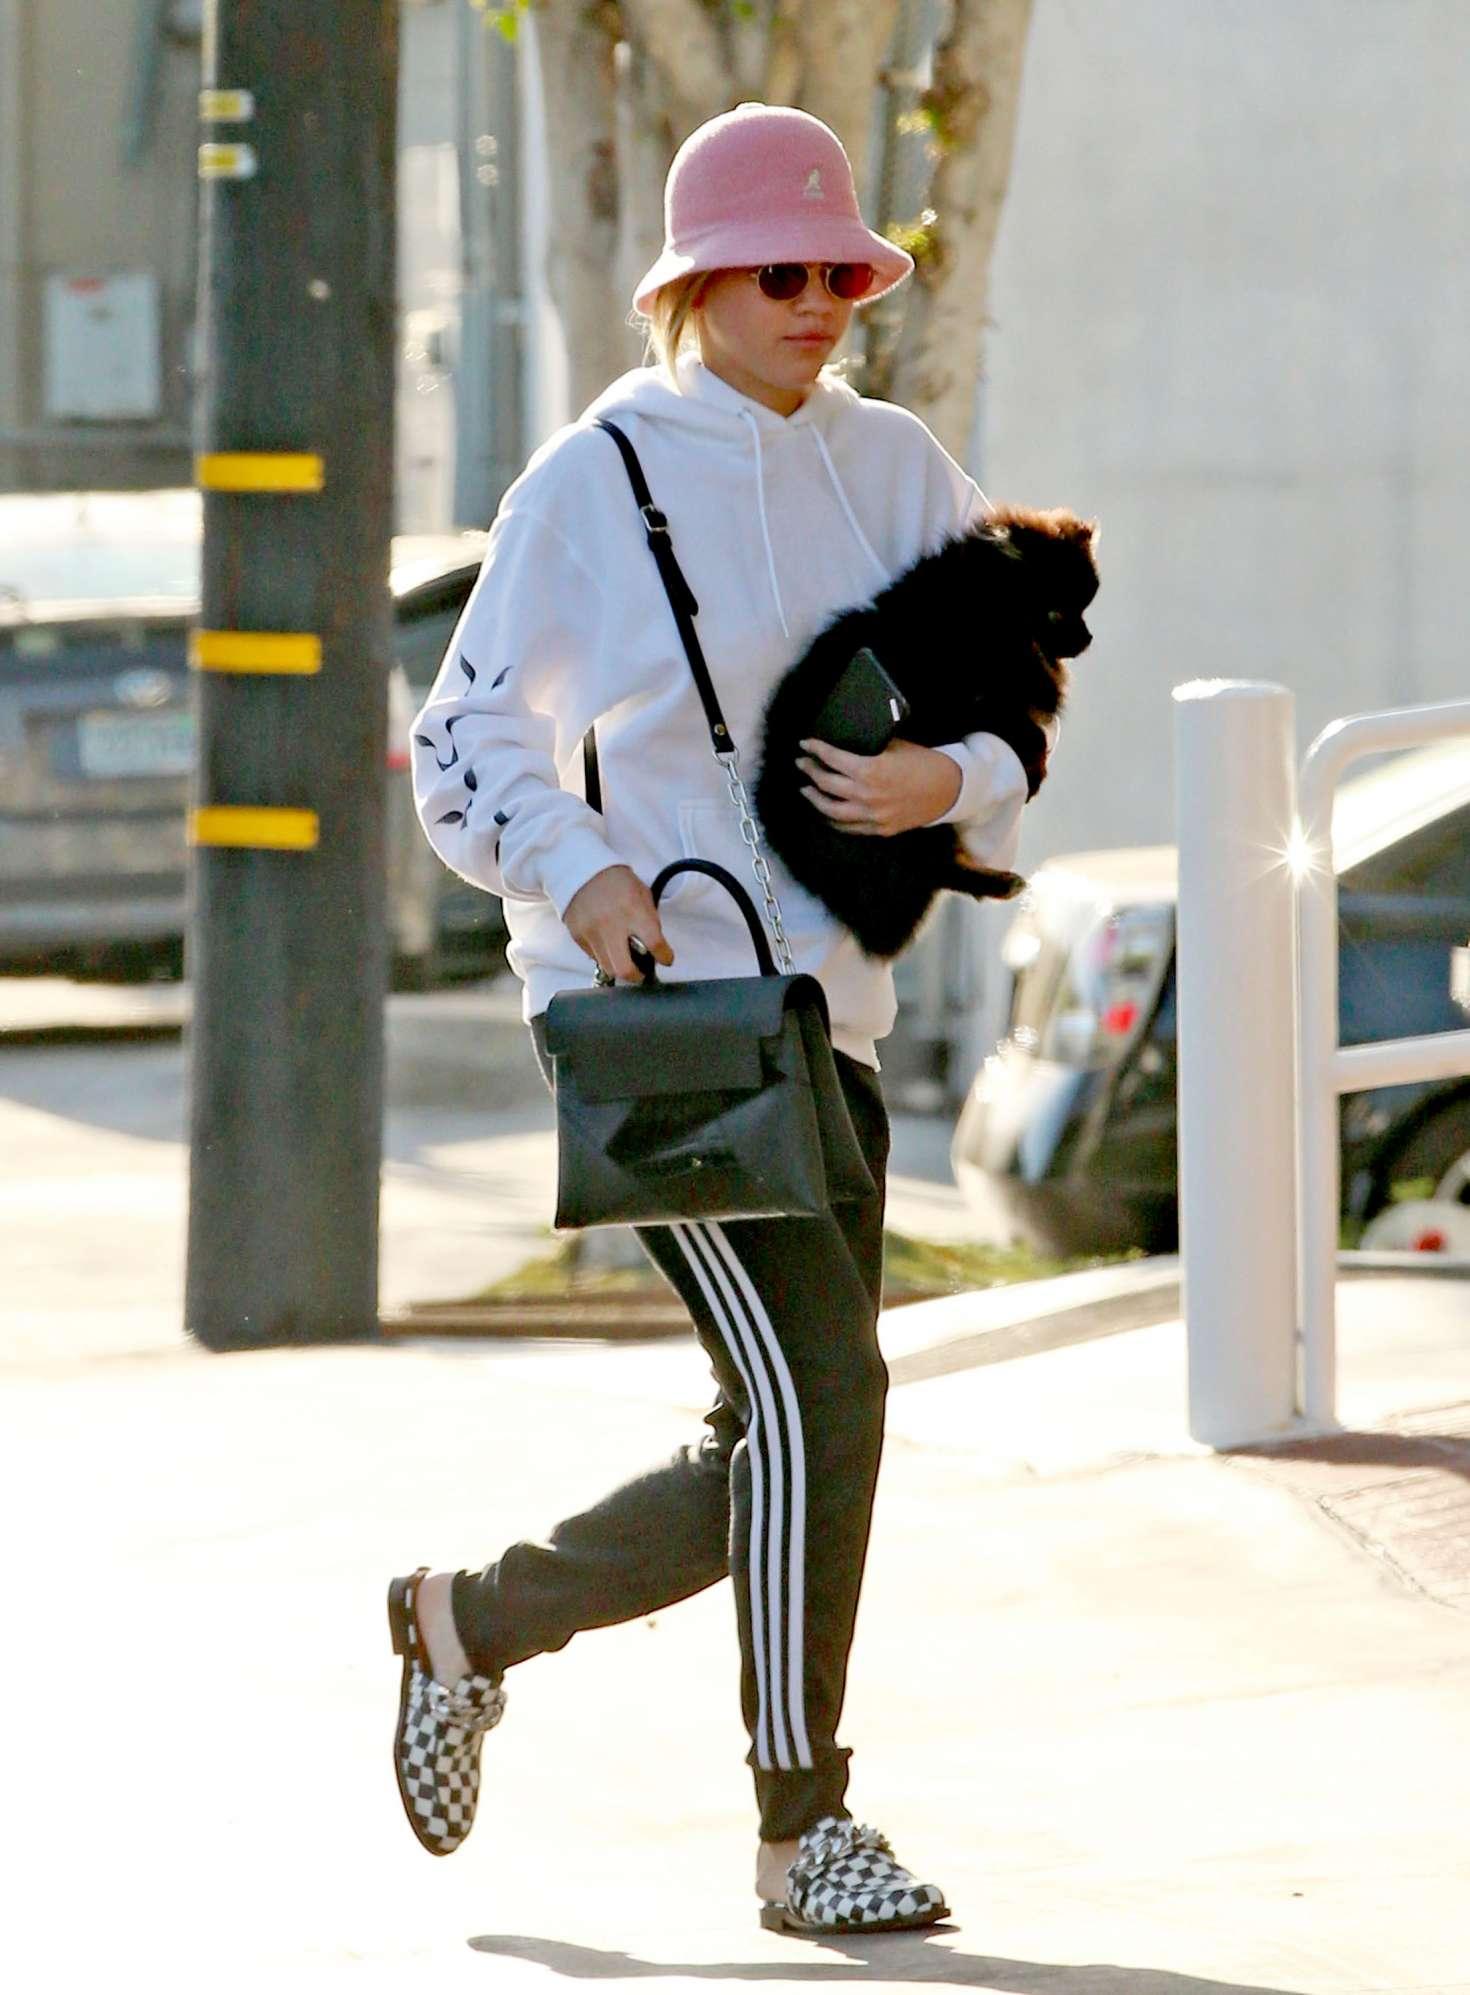 Sofia Richie 2017 : Sofia Richie With a Friend out in LA -02